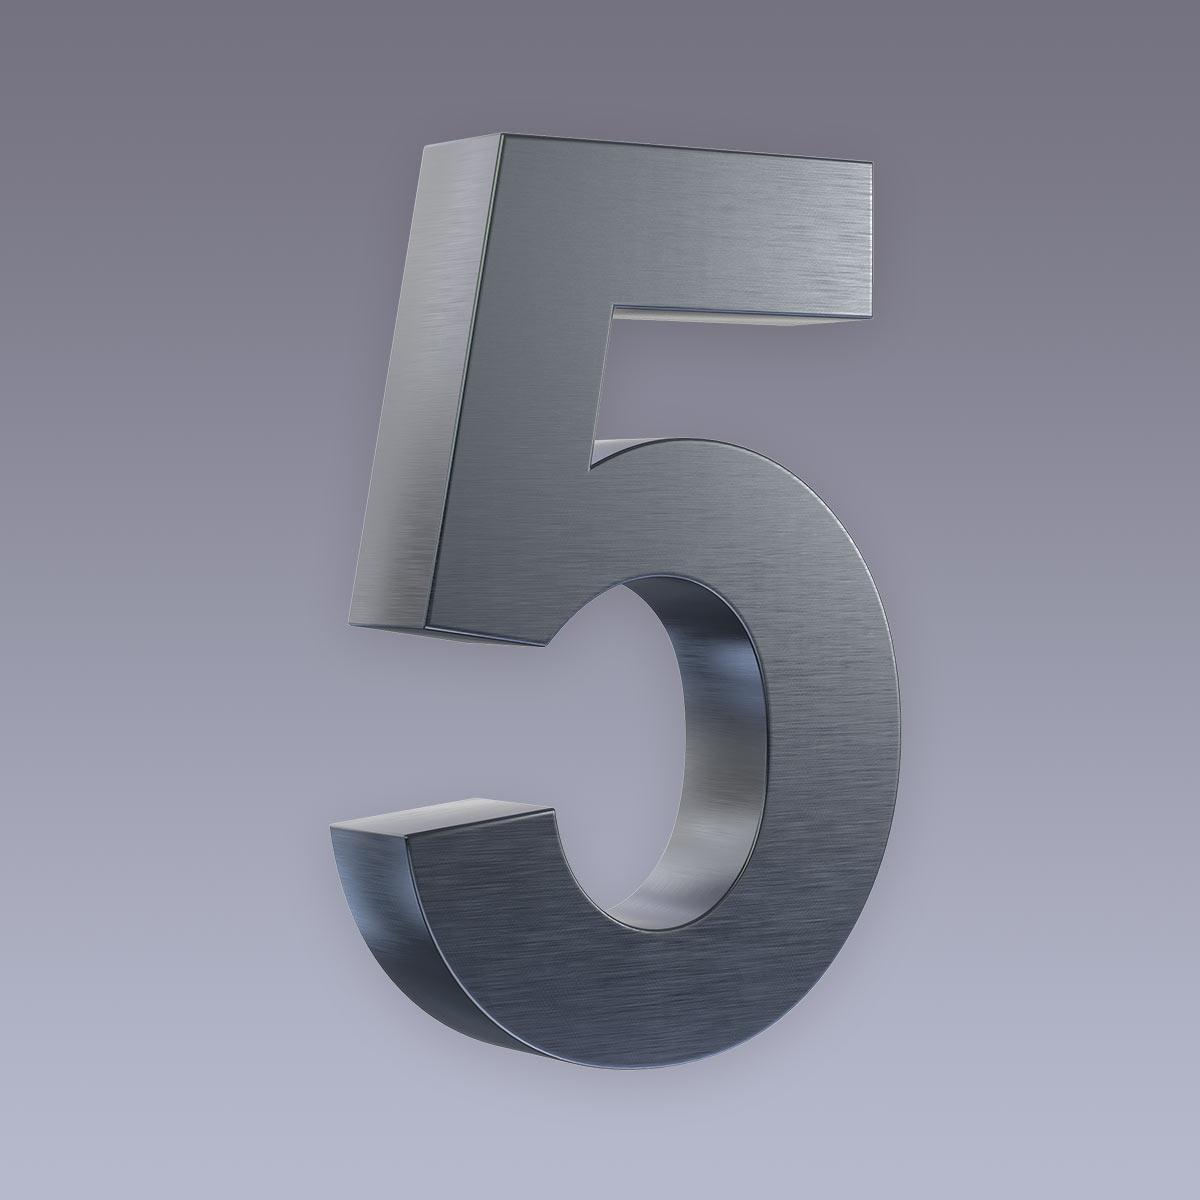 3D Hausnummer 5 Edelstahl anthrazit RAL7016 in 3D Design Arial